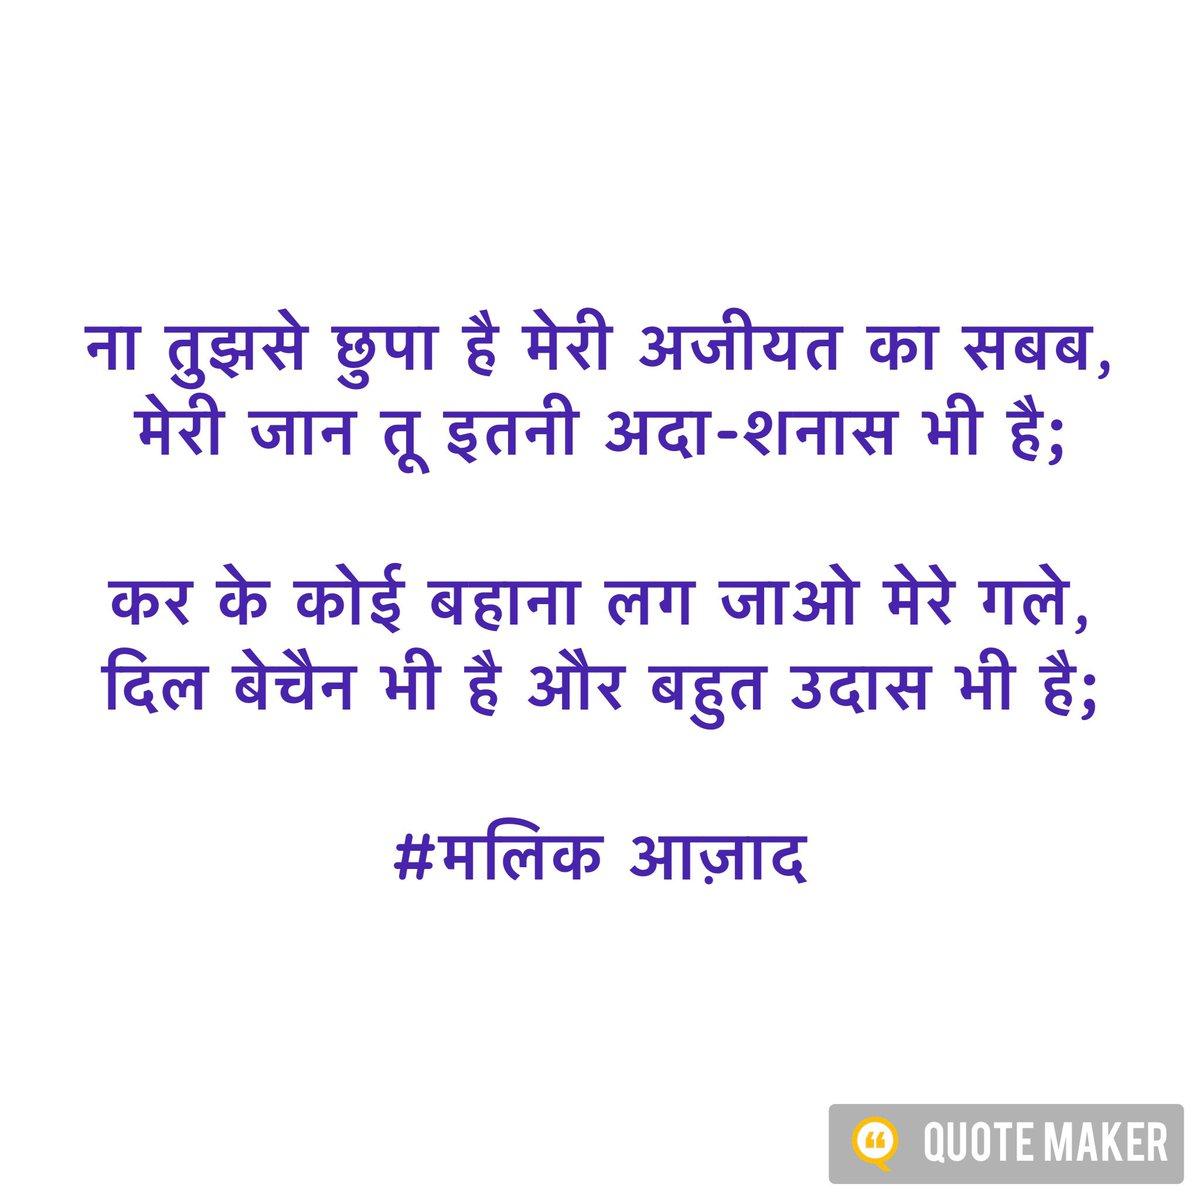 """बहुत दूर है मुझसे लेकिन पास भी है"":-   #BREAKING #Ishqbaaaz #follow #GhumHaiKisikeyPyaarMeiin #fridaymorning #urdupoetry #shayari #hindiquotes #Hindi #poetrycommunity #followme #kavita #love #quote @amarujalakavya @JashneRekhta @Pratilipi_Hindi @NBTDilli"